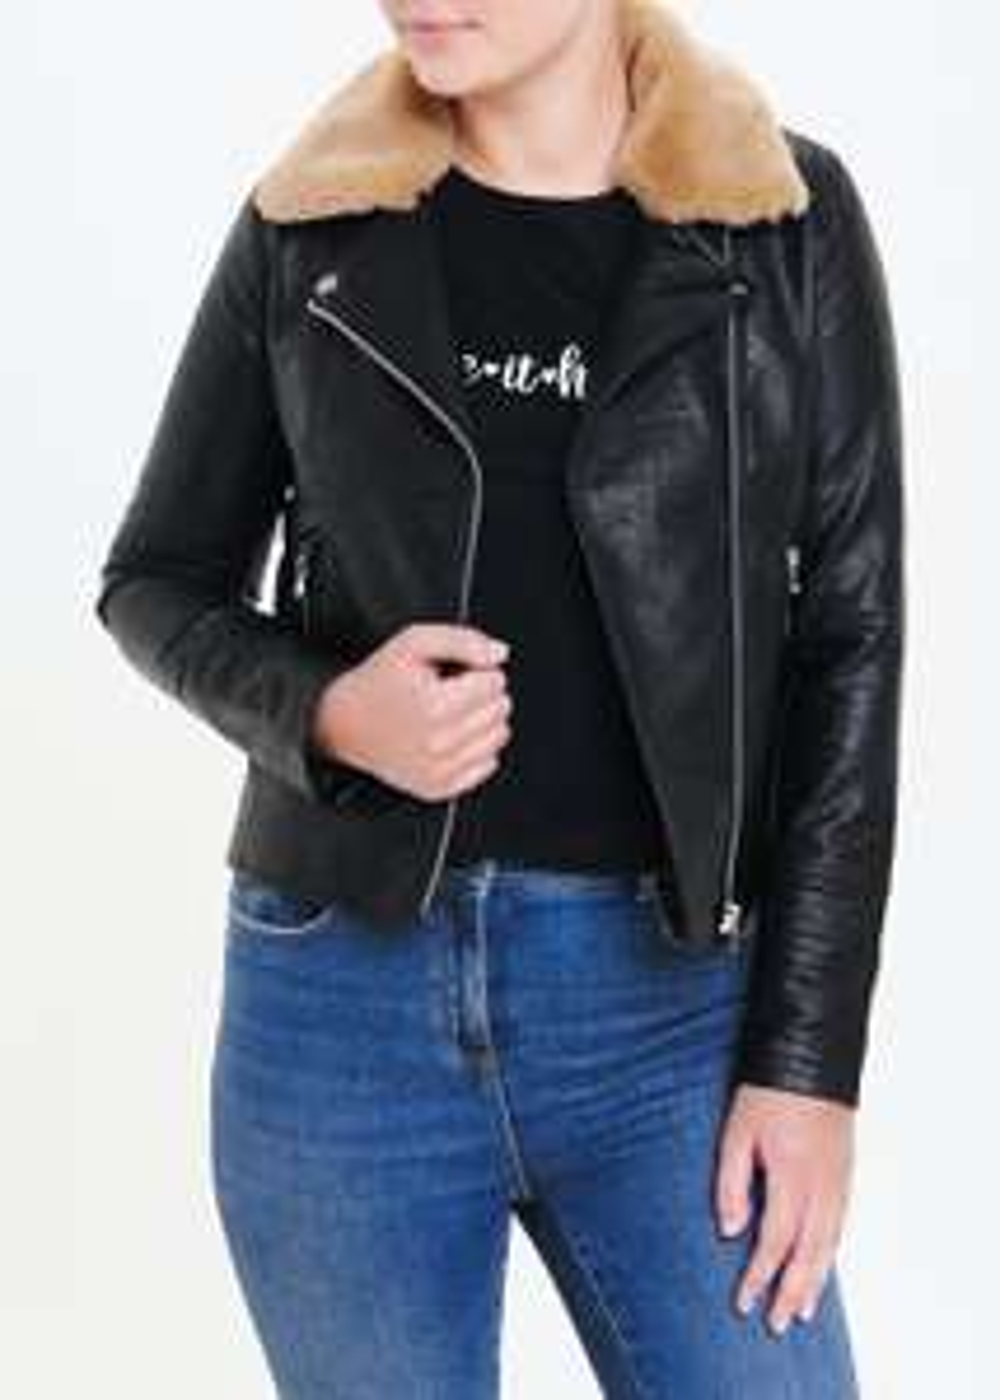 Black Faux Fur Collar Biker Jacket With detachable collar - £17 - Free click & Collect @ Matalan